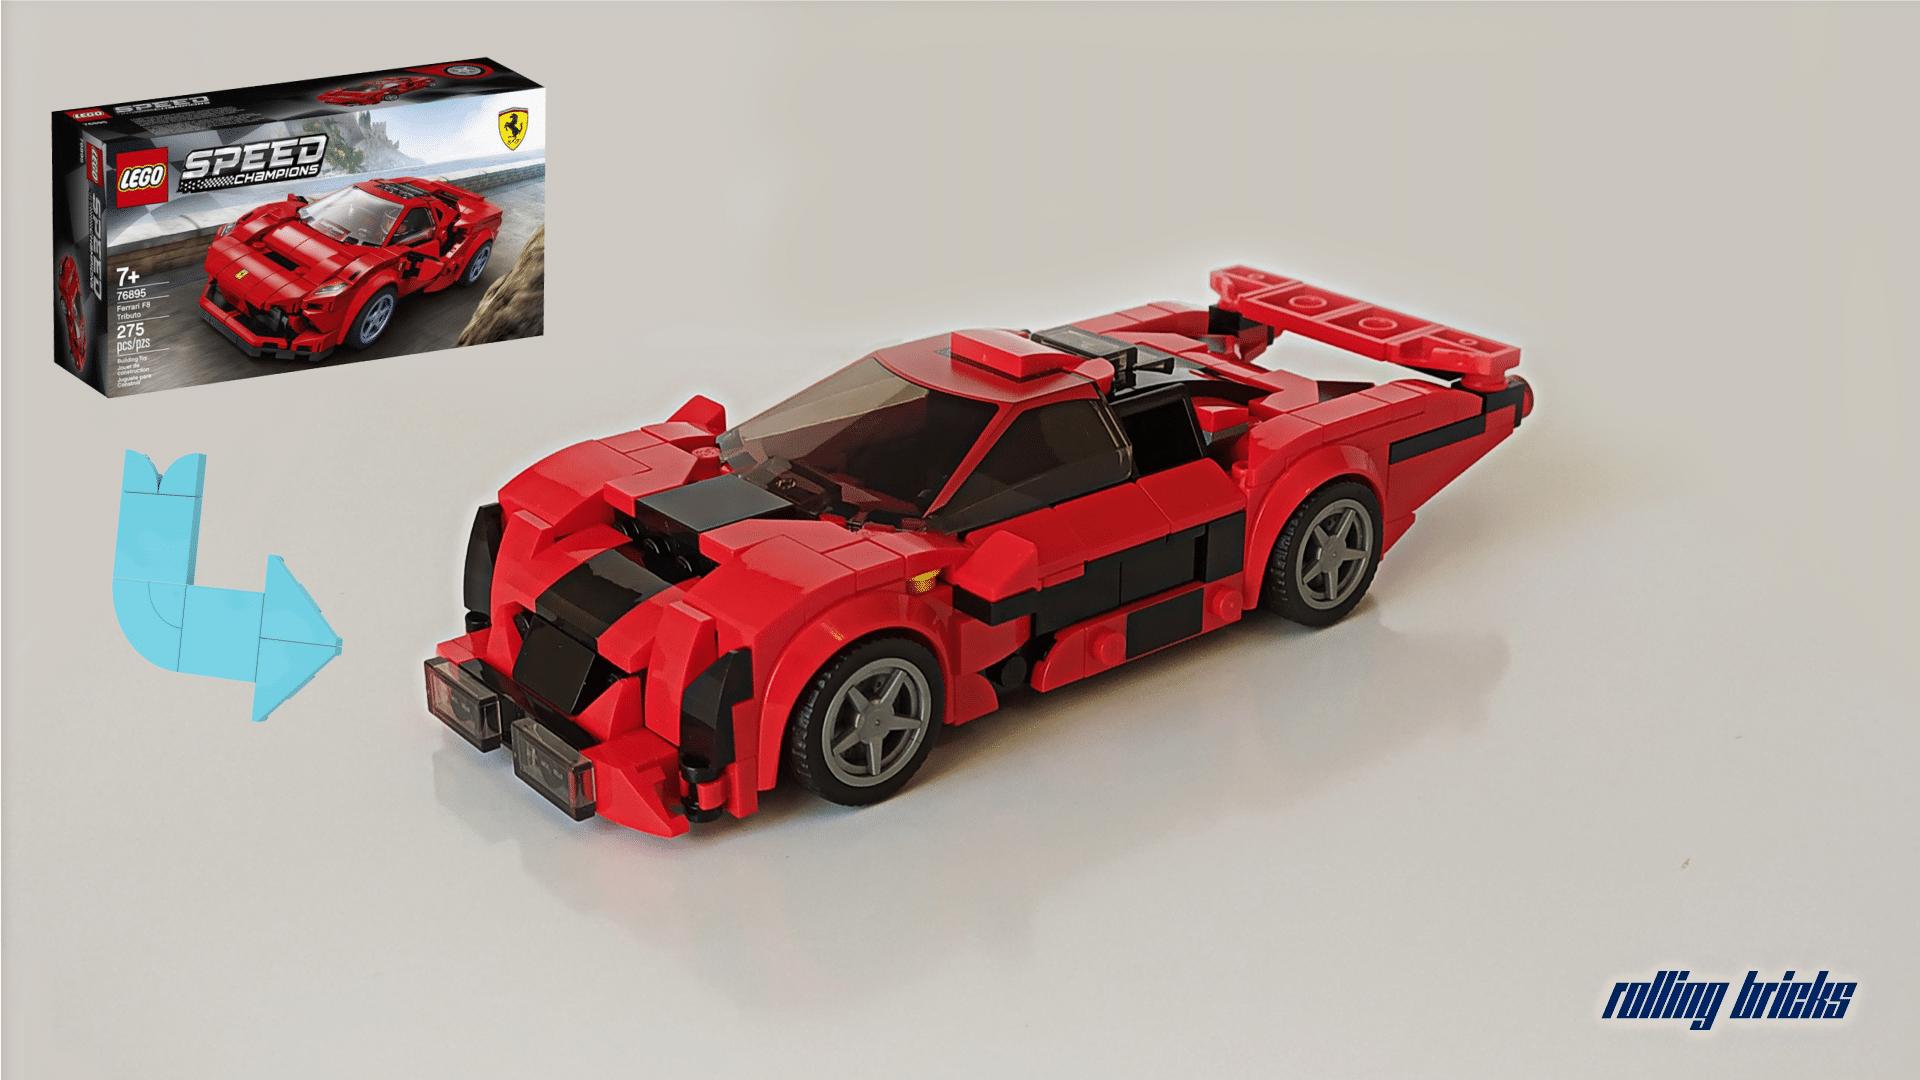 Lego Instructions 76895 Ferrari F8 Tributo Alternative Build Le Mans Racer Lego Instructions Mocsmarket